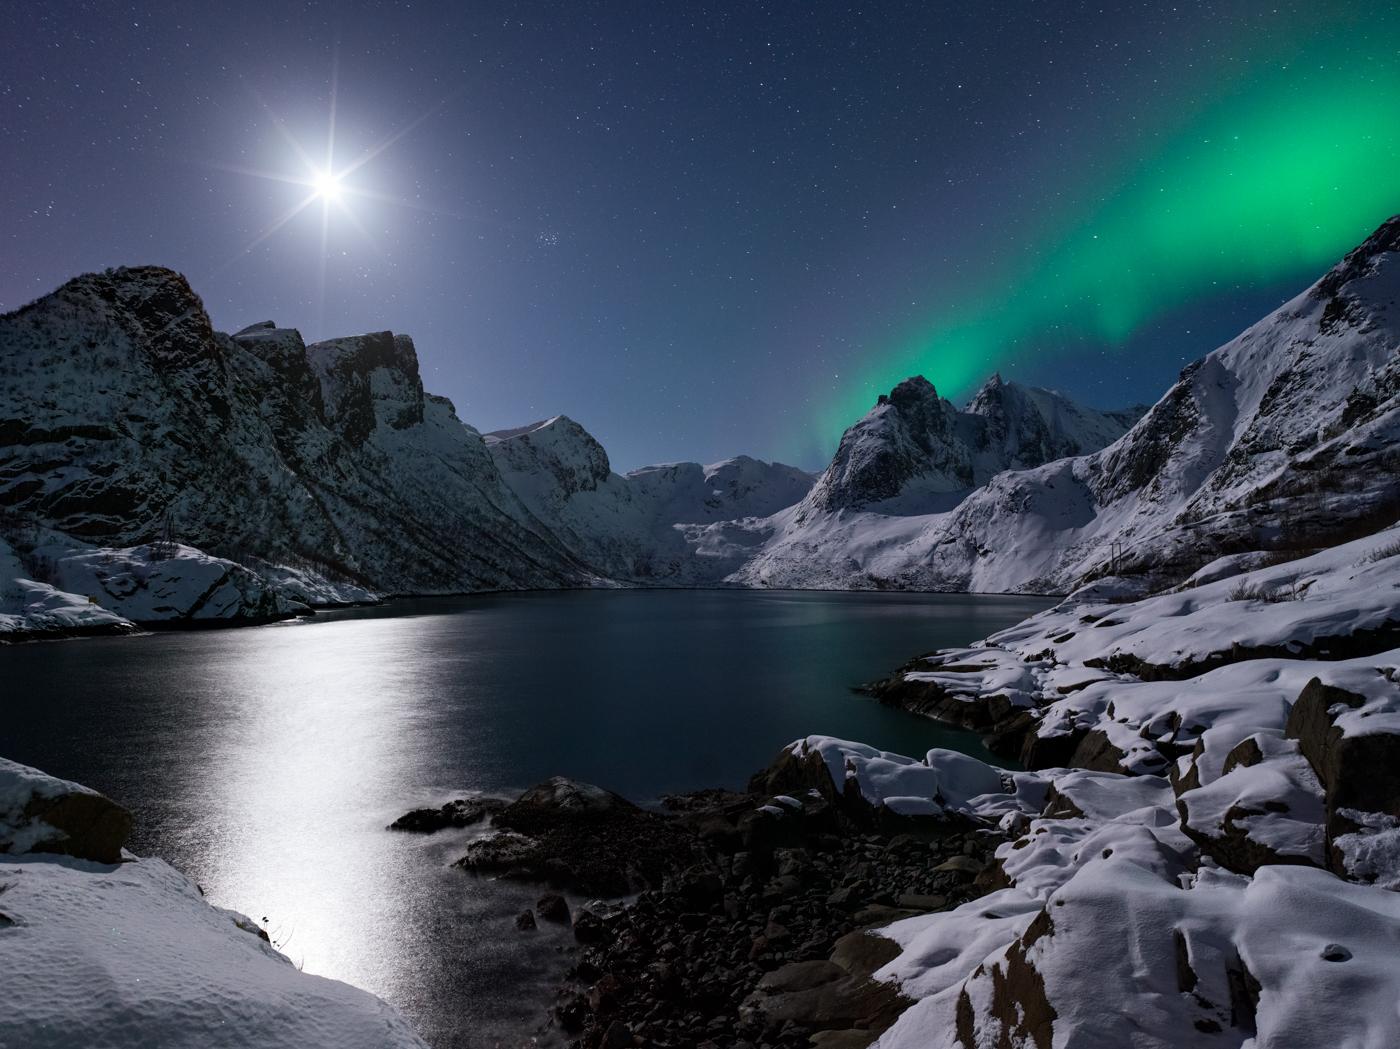 Aurora Borealis | Landschapsfotograaf Harmen Piekema